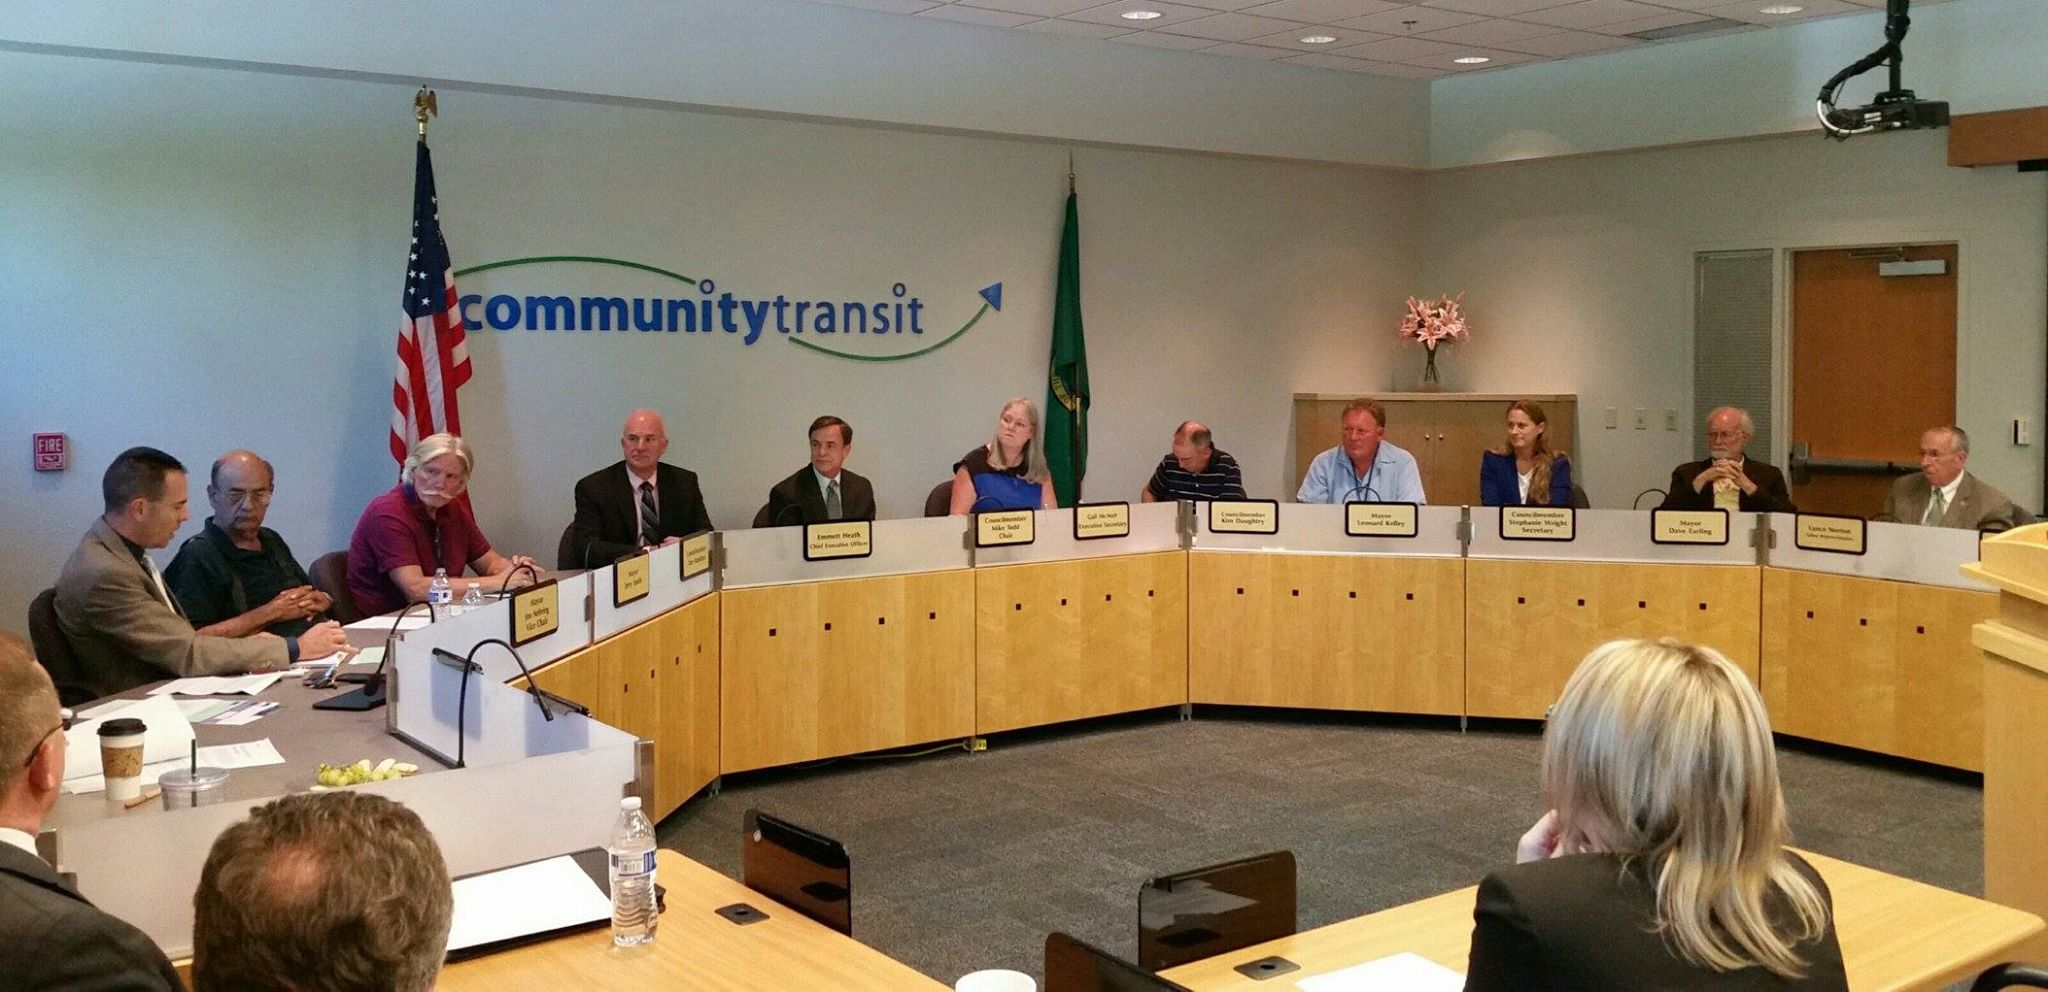 Community Transit Sends Transit Expansion Measure to